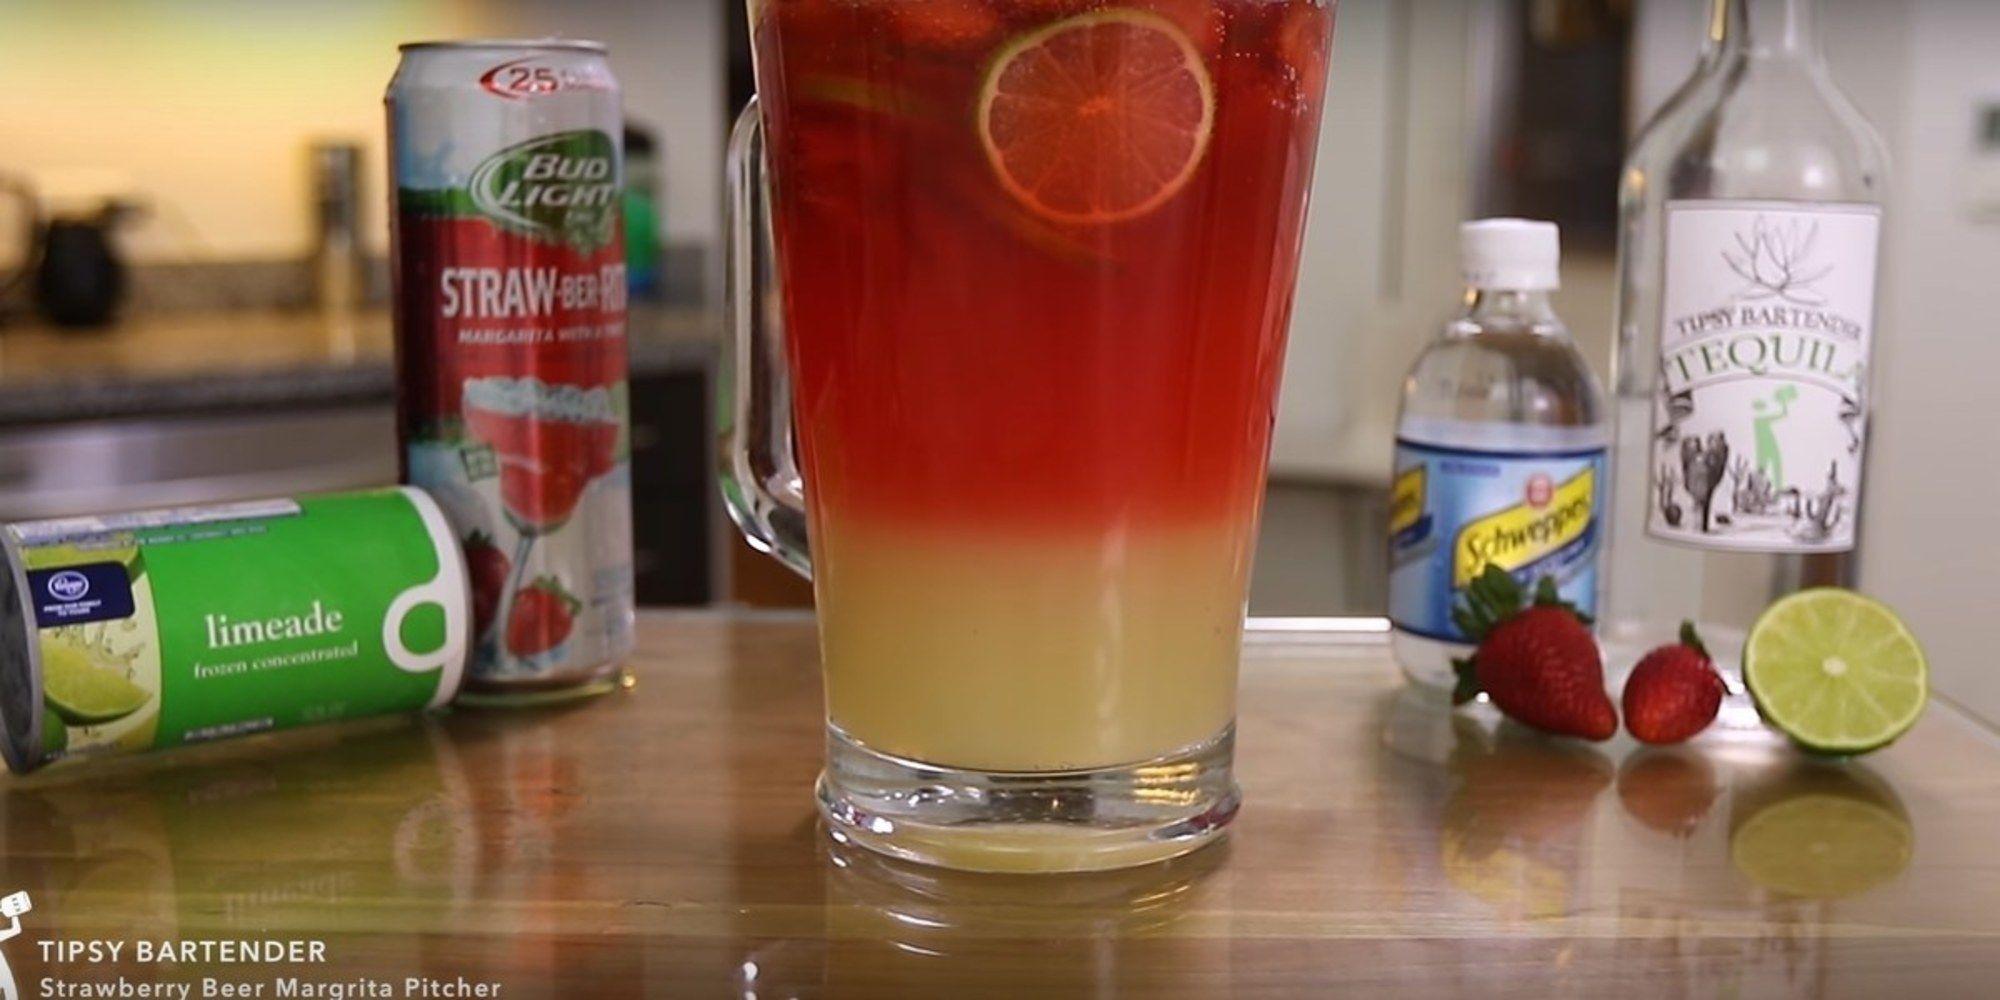 Strawberry Beer Rita Makes For The Perfect Weekend Cocktail Recipe Strawberry Beer Strawberry Beer Margarita Recipe Beer